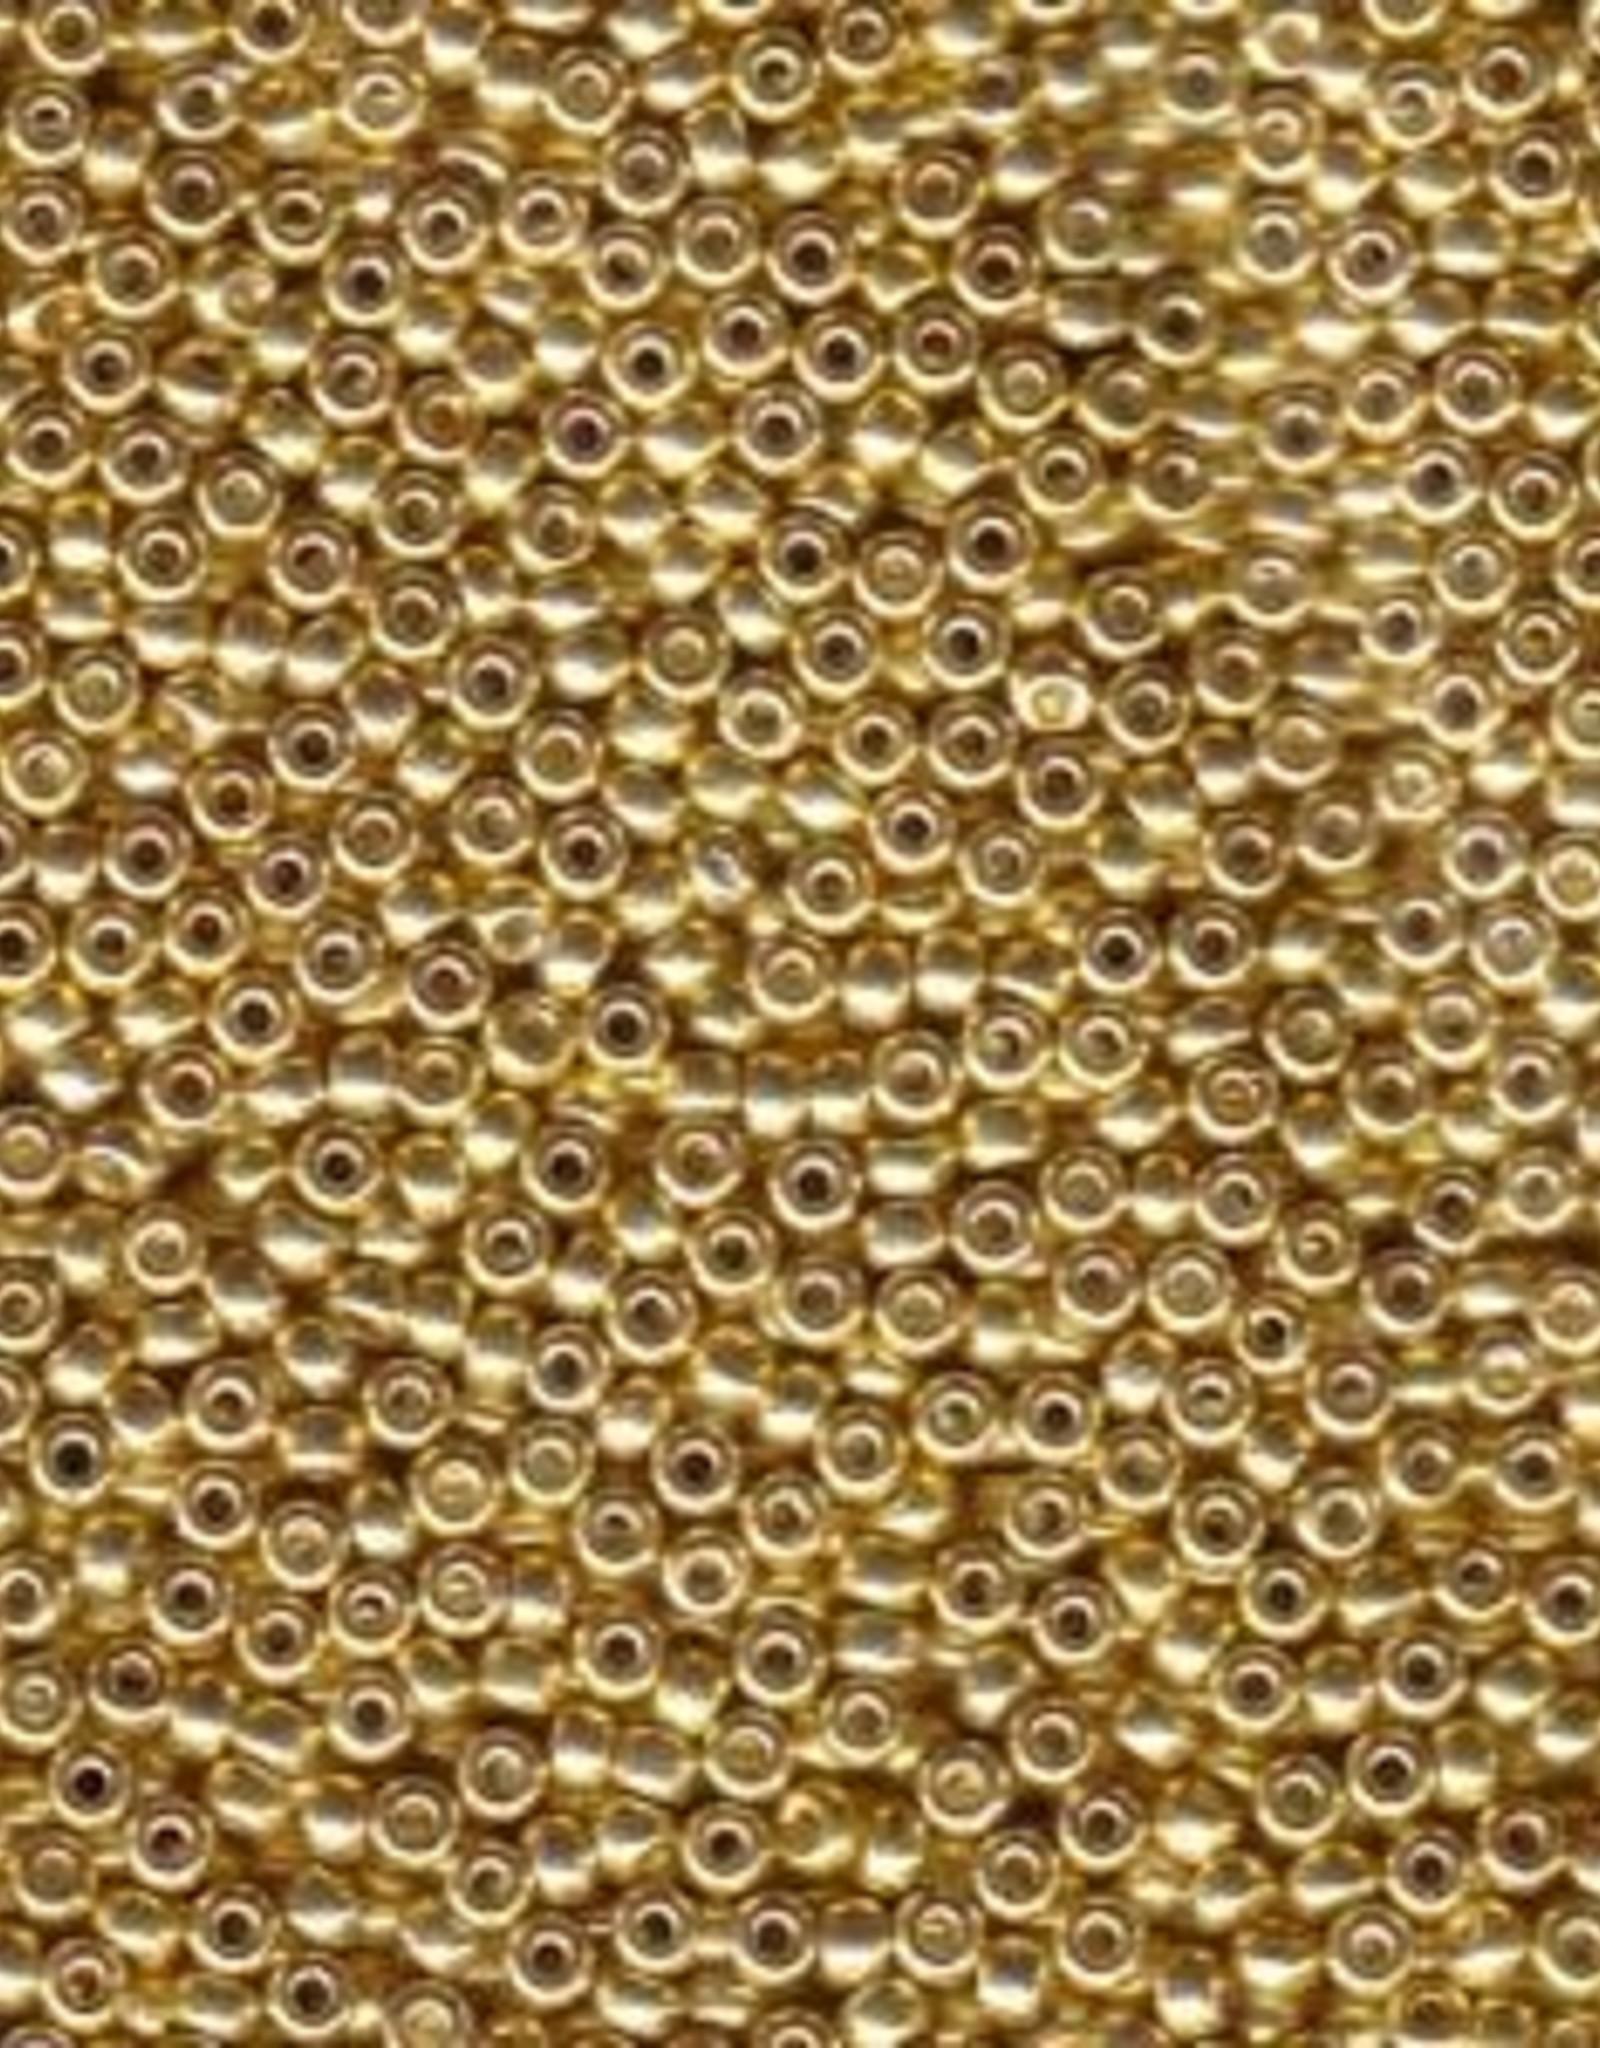 SB11 Galv Yellow Gold